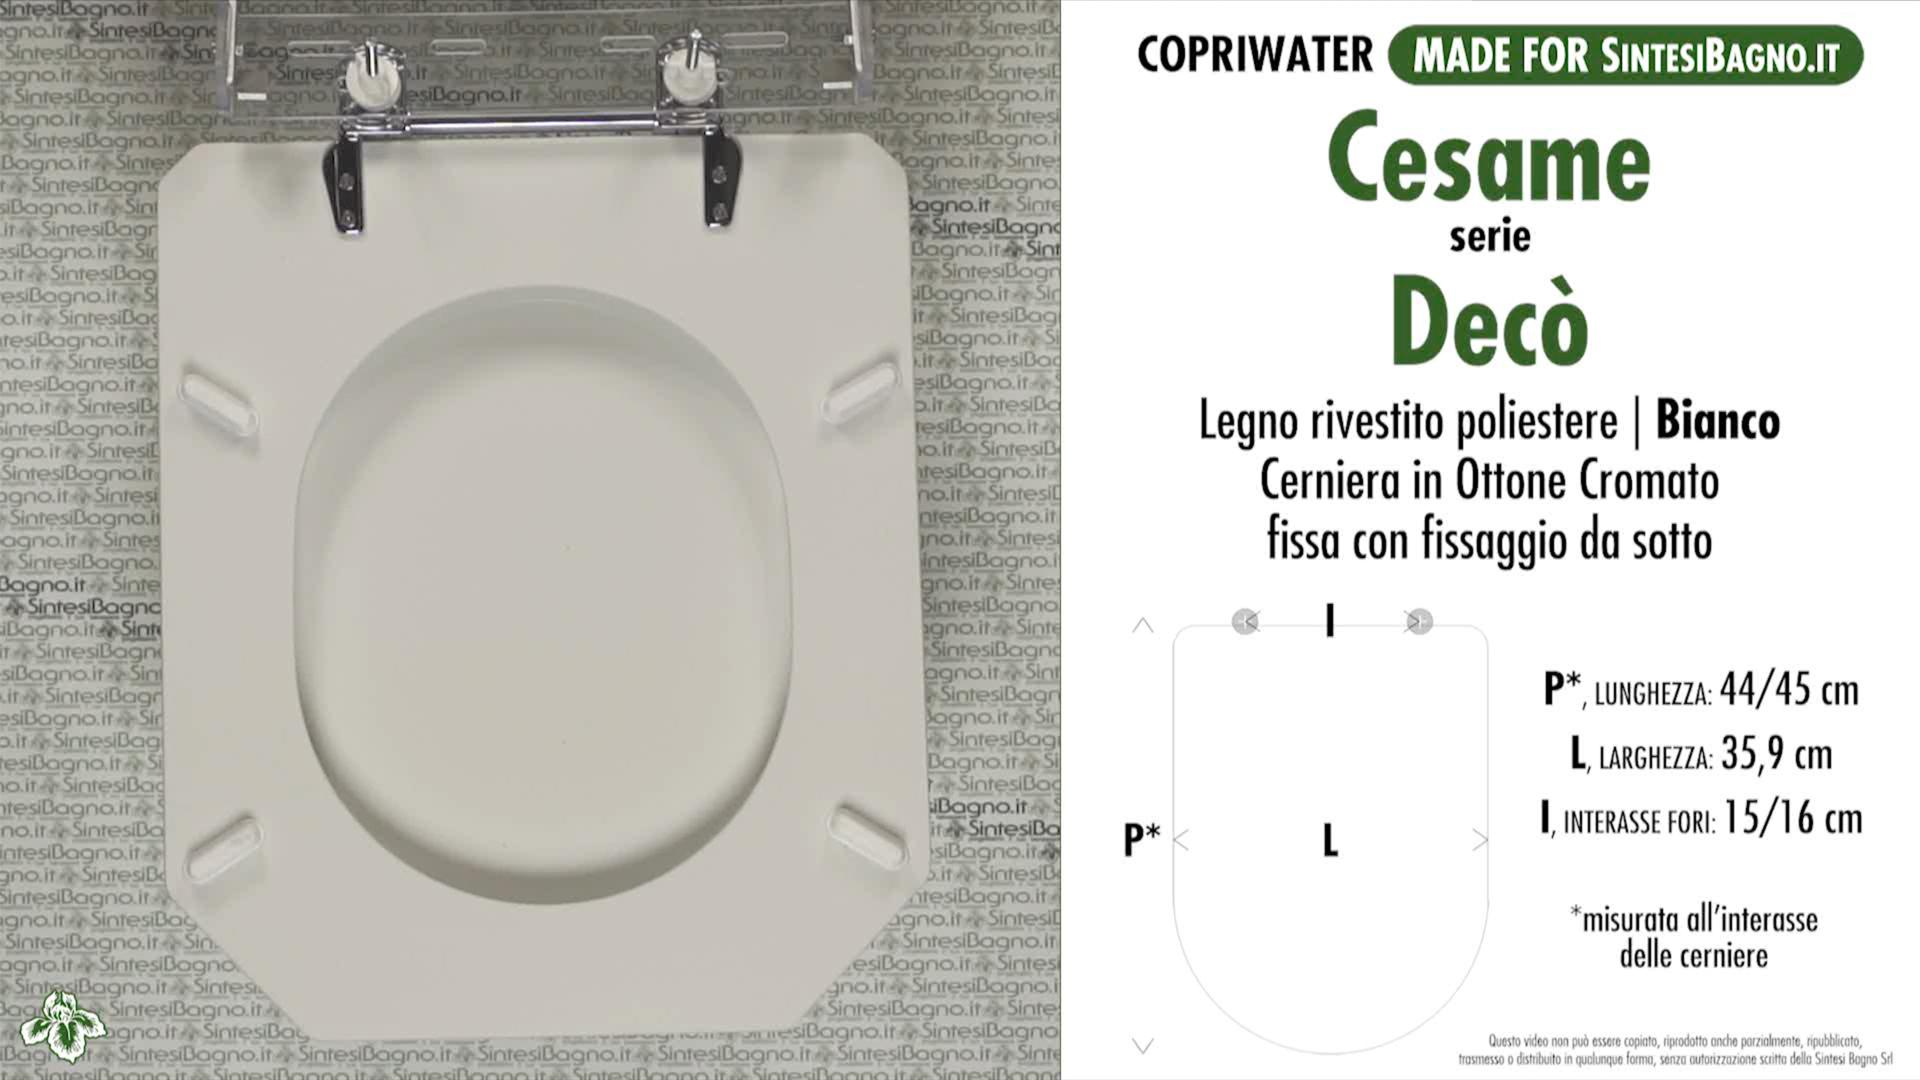 SCHEDA TECNICA MISURE copriwater CESAME DECO'